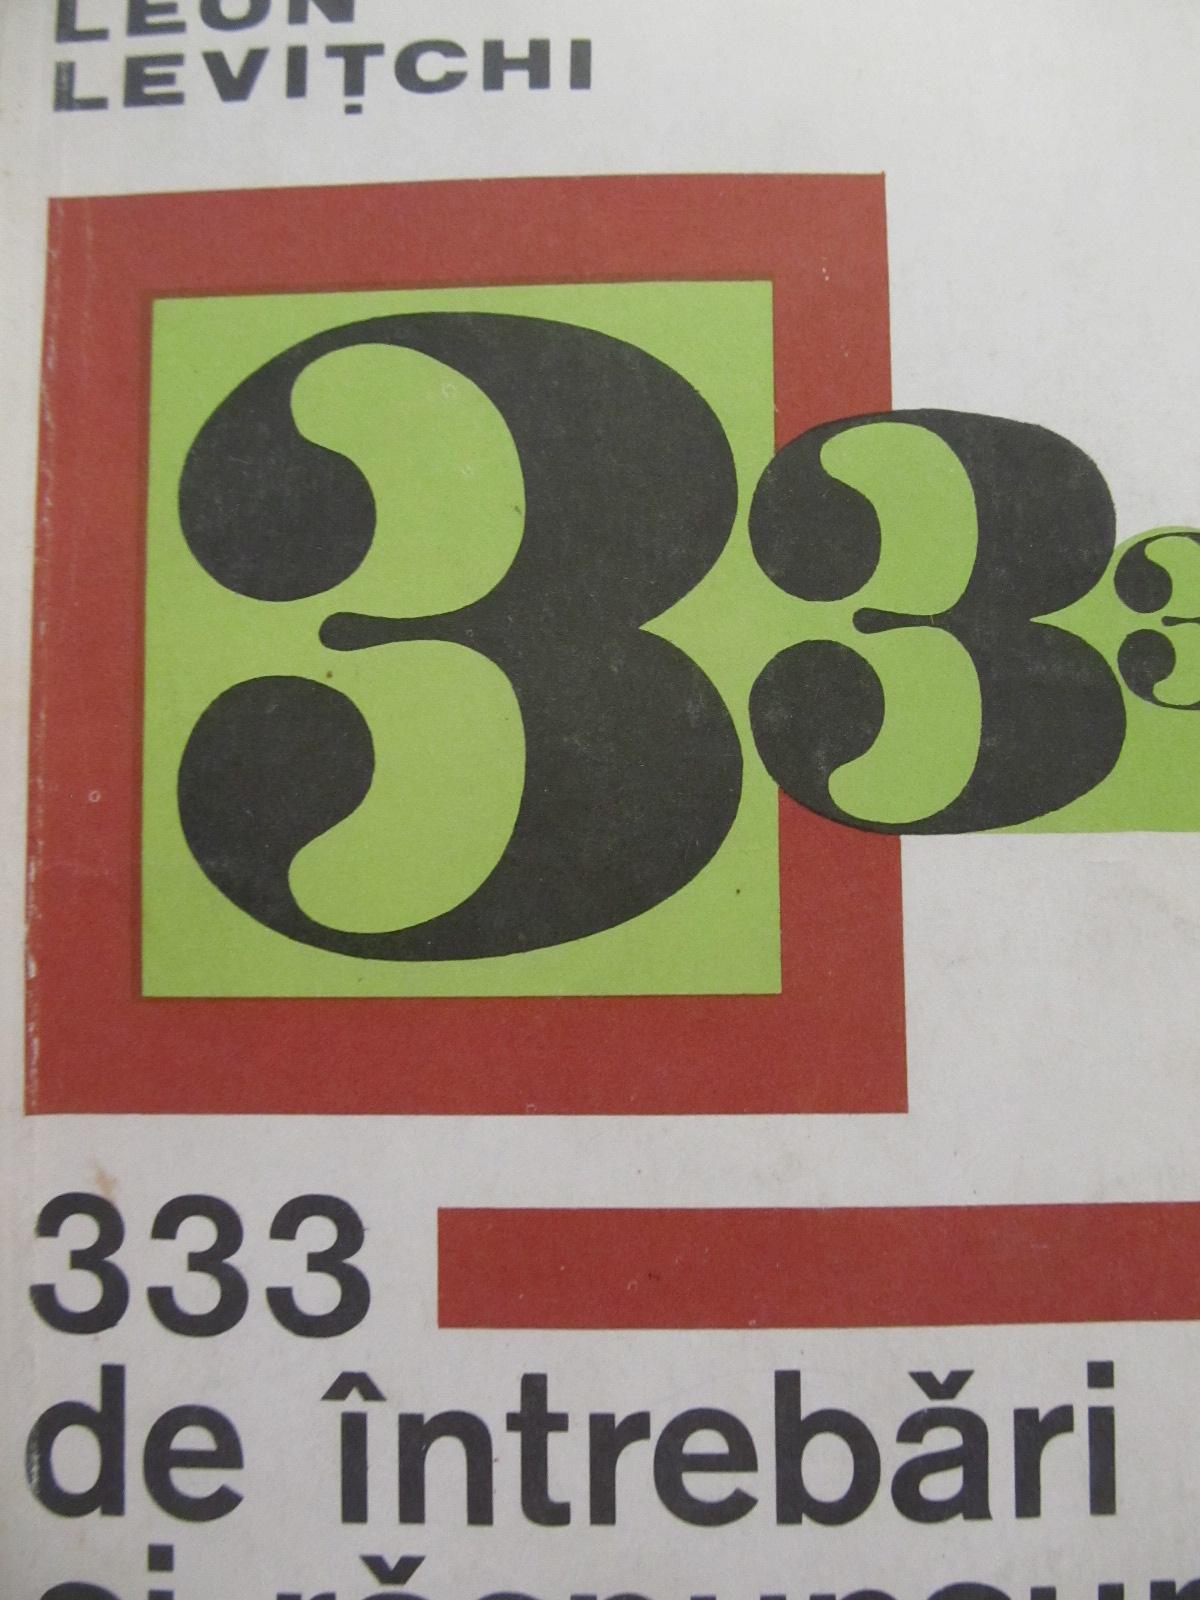 333 de intrebari si raspunsuri din gramatica engleza [1] - Leon Levitchi | Detalii carte